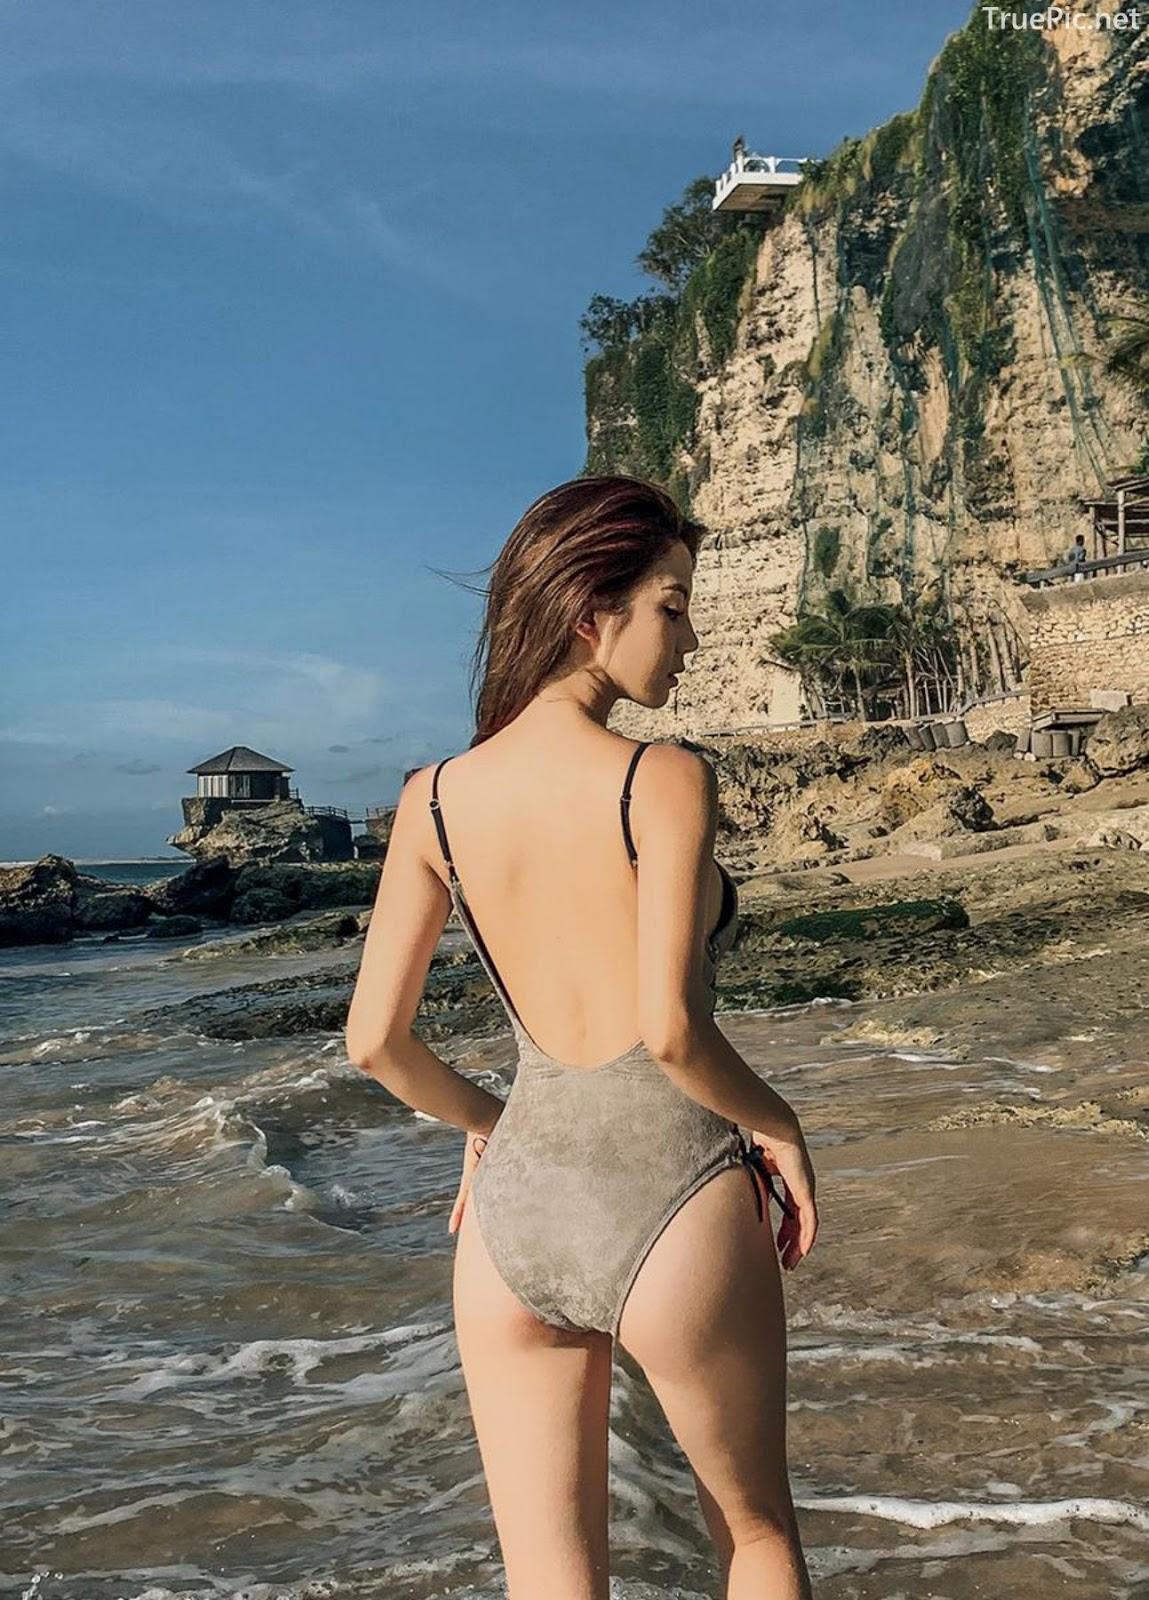 Korean fashion model Lee Chae Eun - Push Monokini - Picture 7